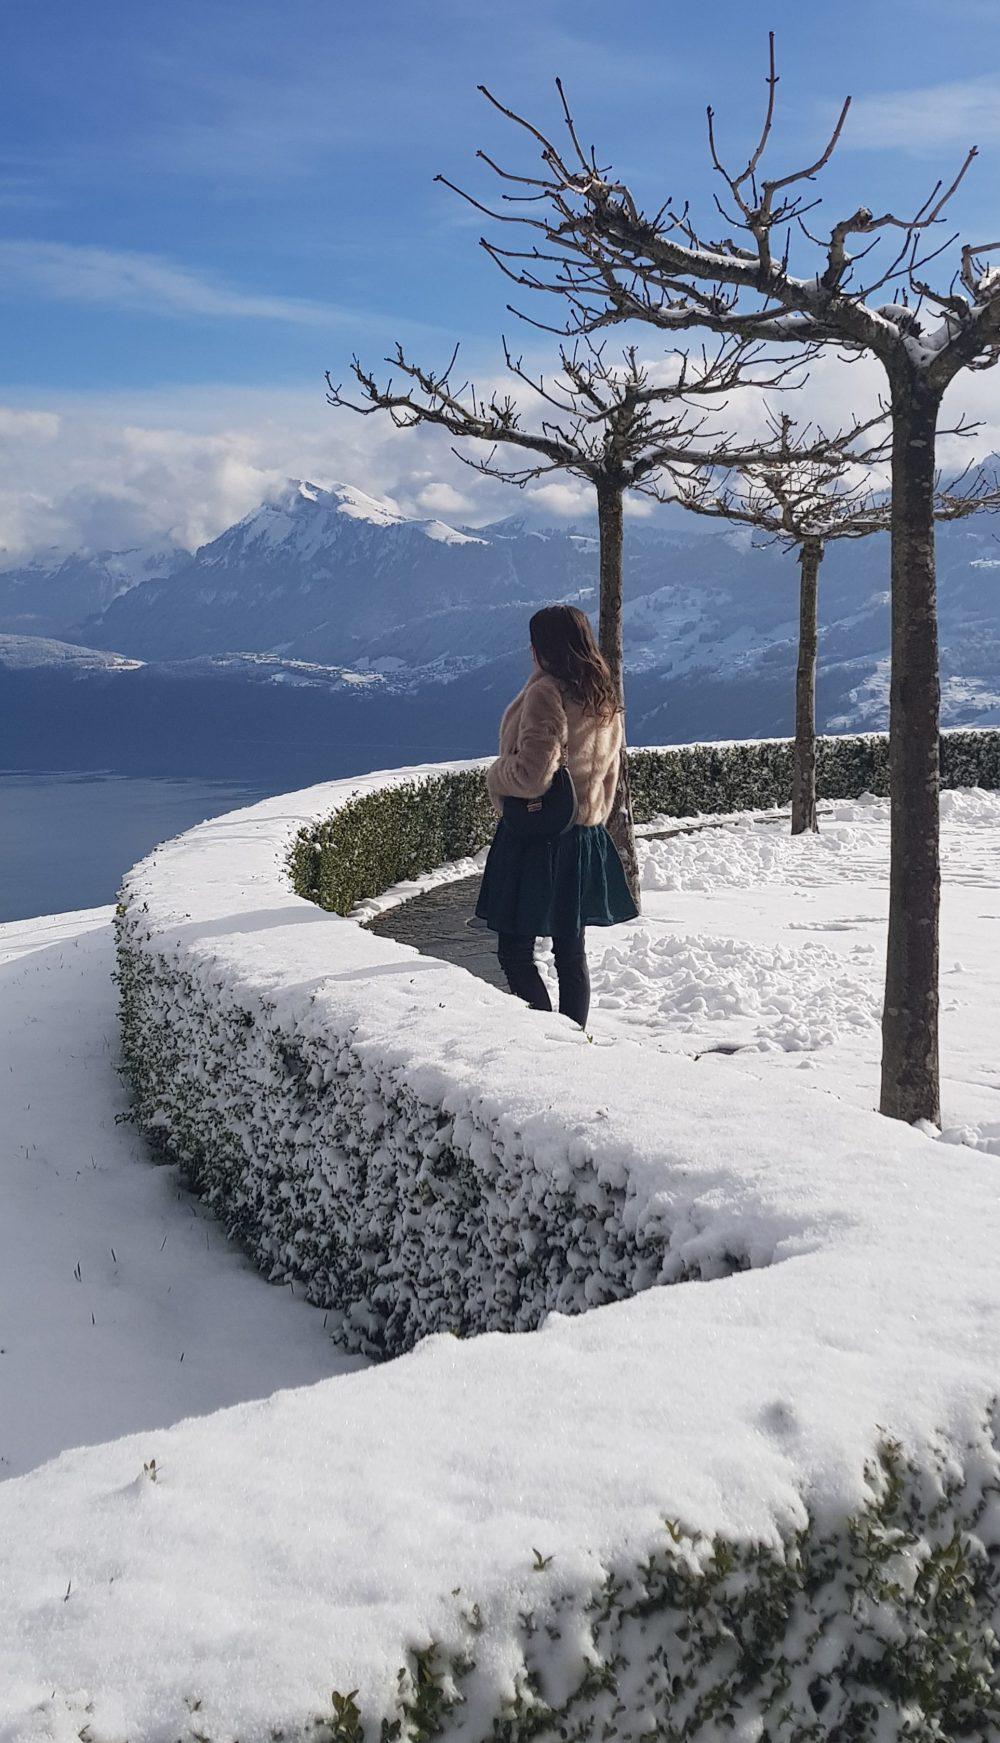 Hotel Villa Honegg en ce qui concerne hotel villa honegg, switzerland | alexandra cristian